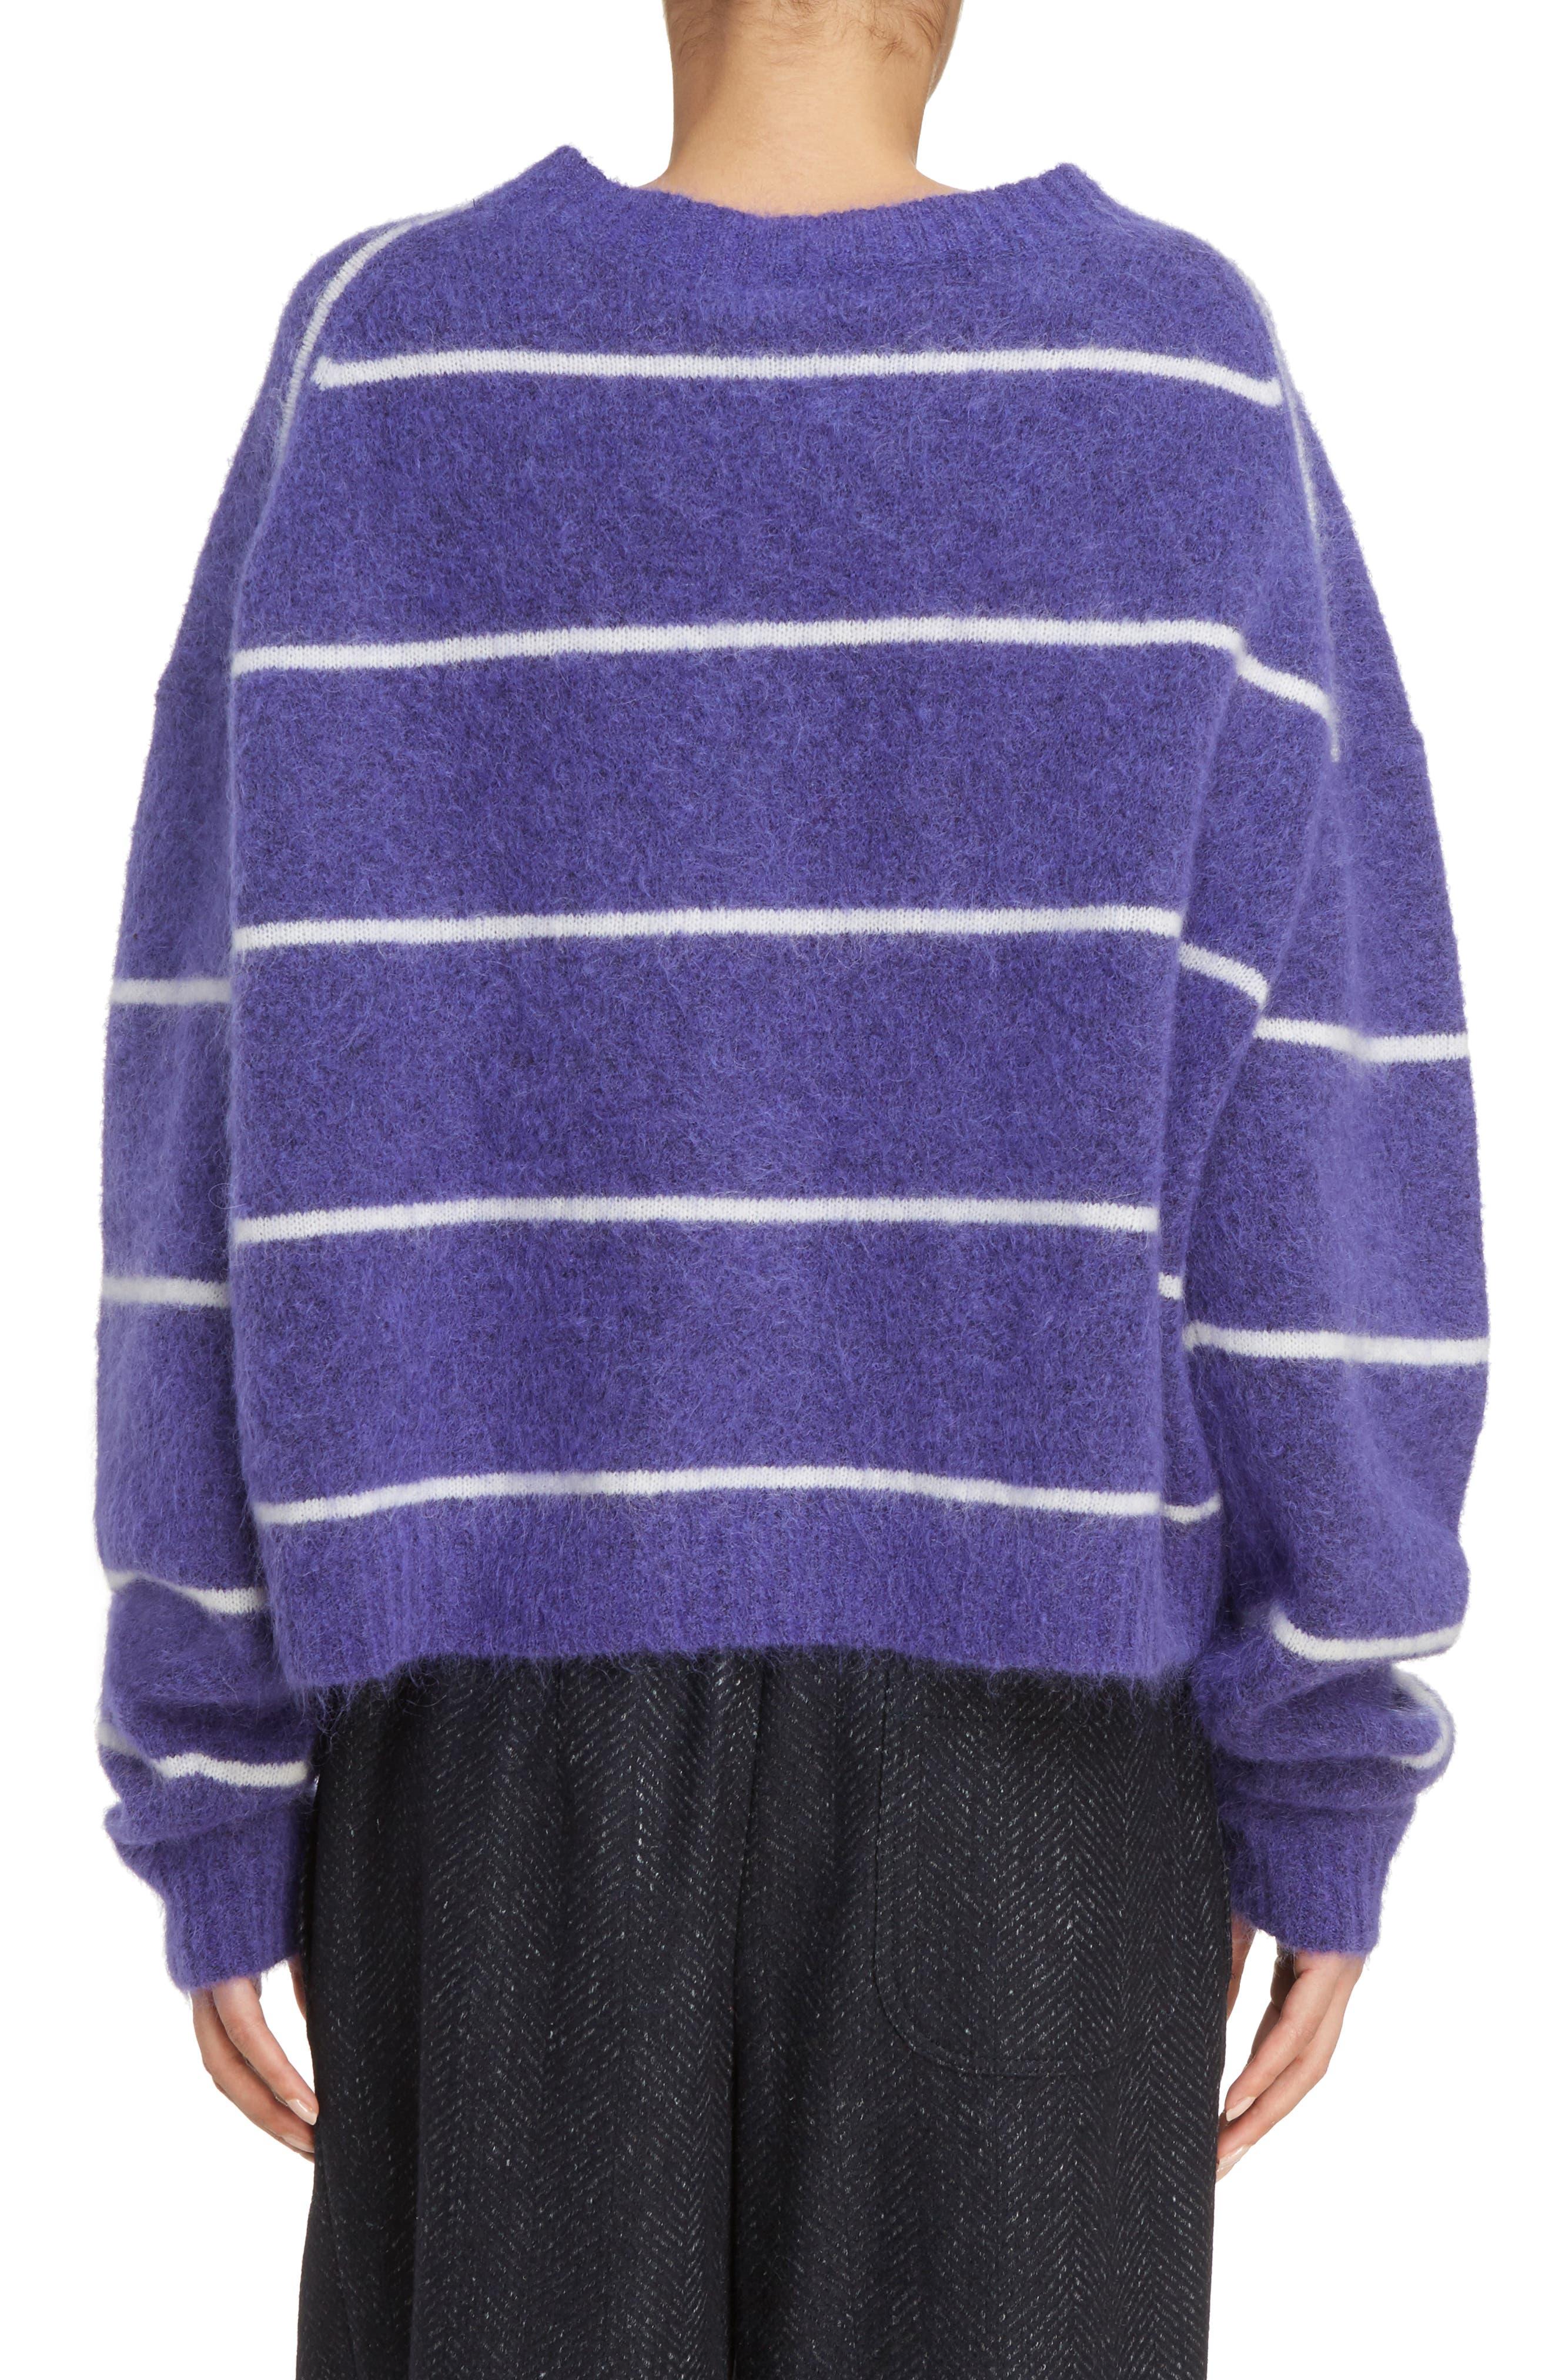 Rhira Stripe Crewneck Sweater,                             Alternate thumbnail 2, color,                             500